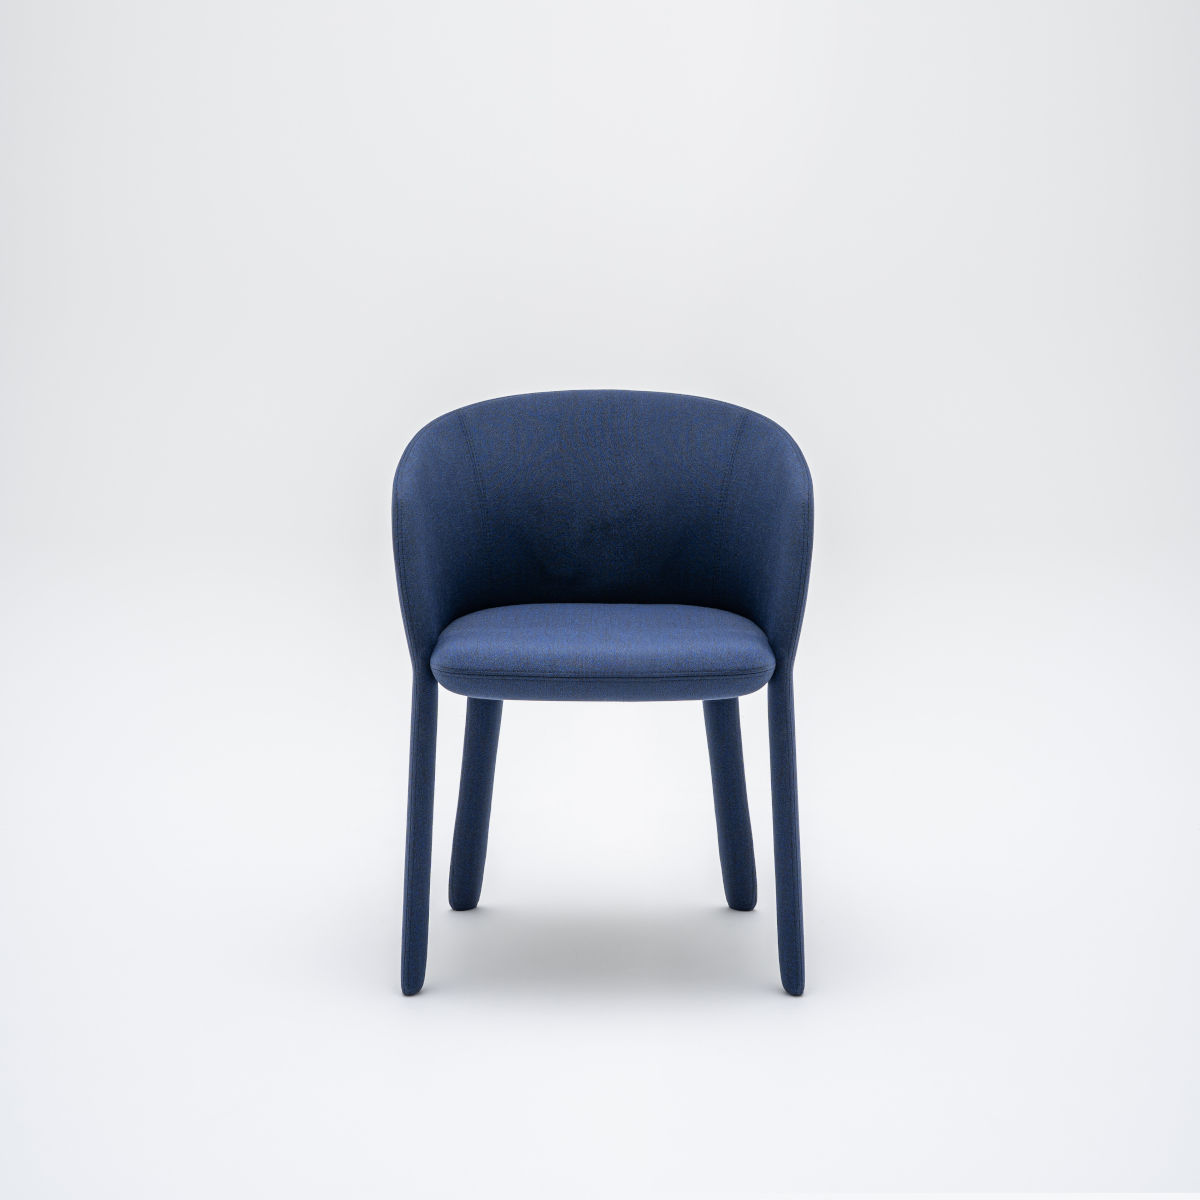 empfangstheken sitzmoebel hotelsitzmoebel blau front